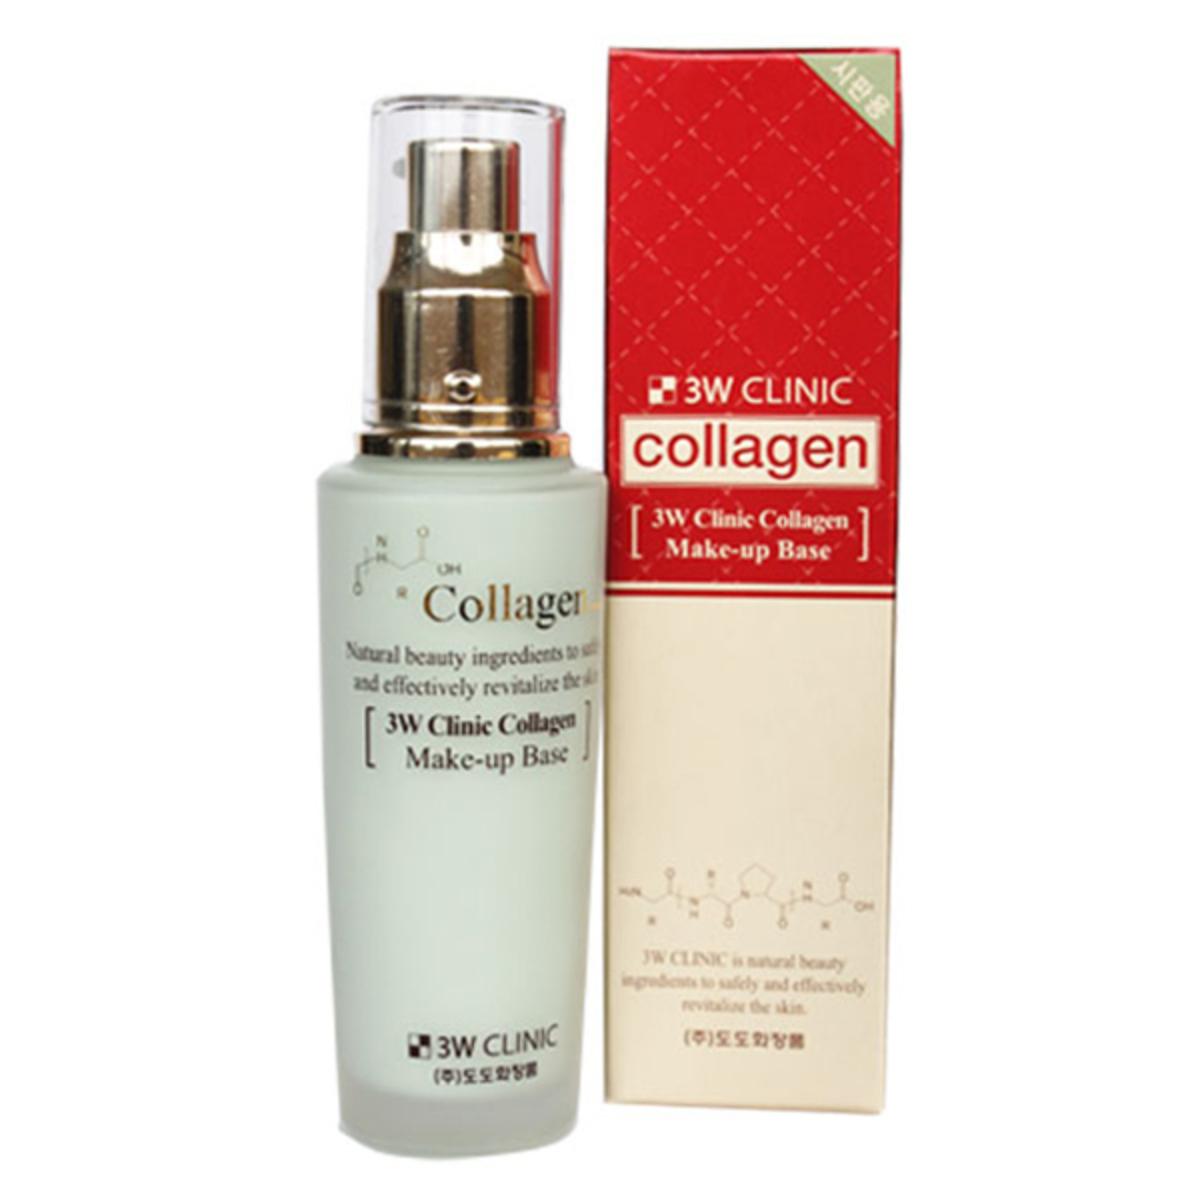 collagen make-up base (green) 50ml